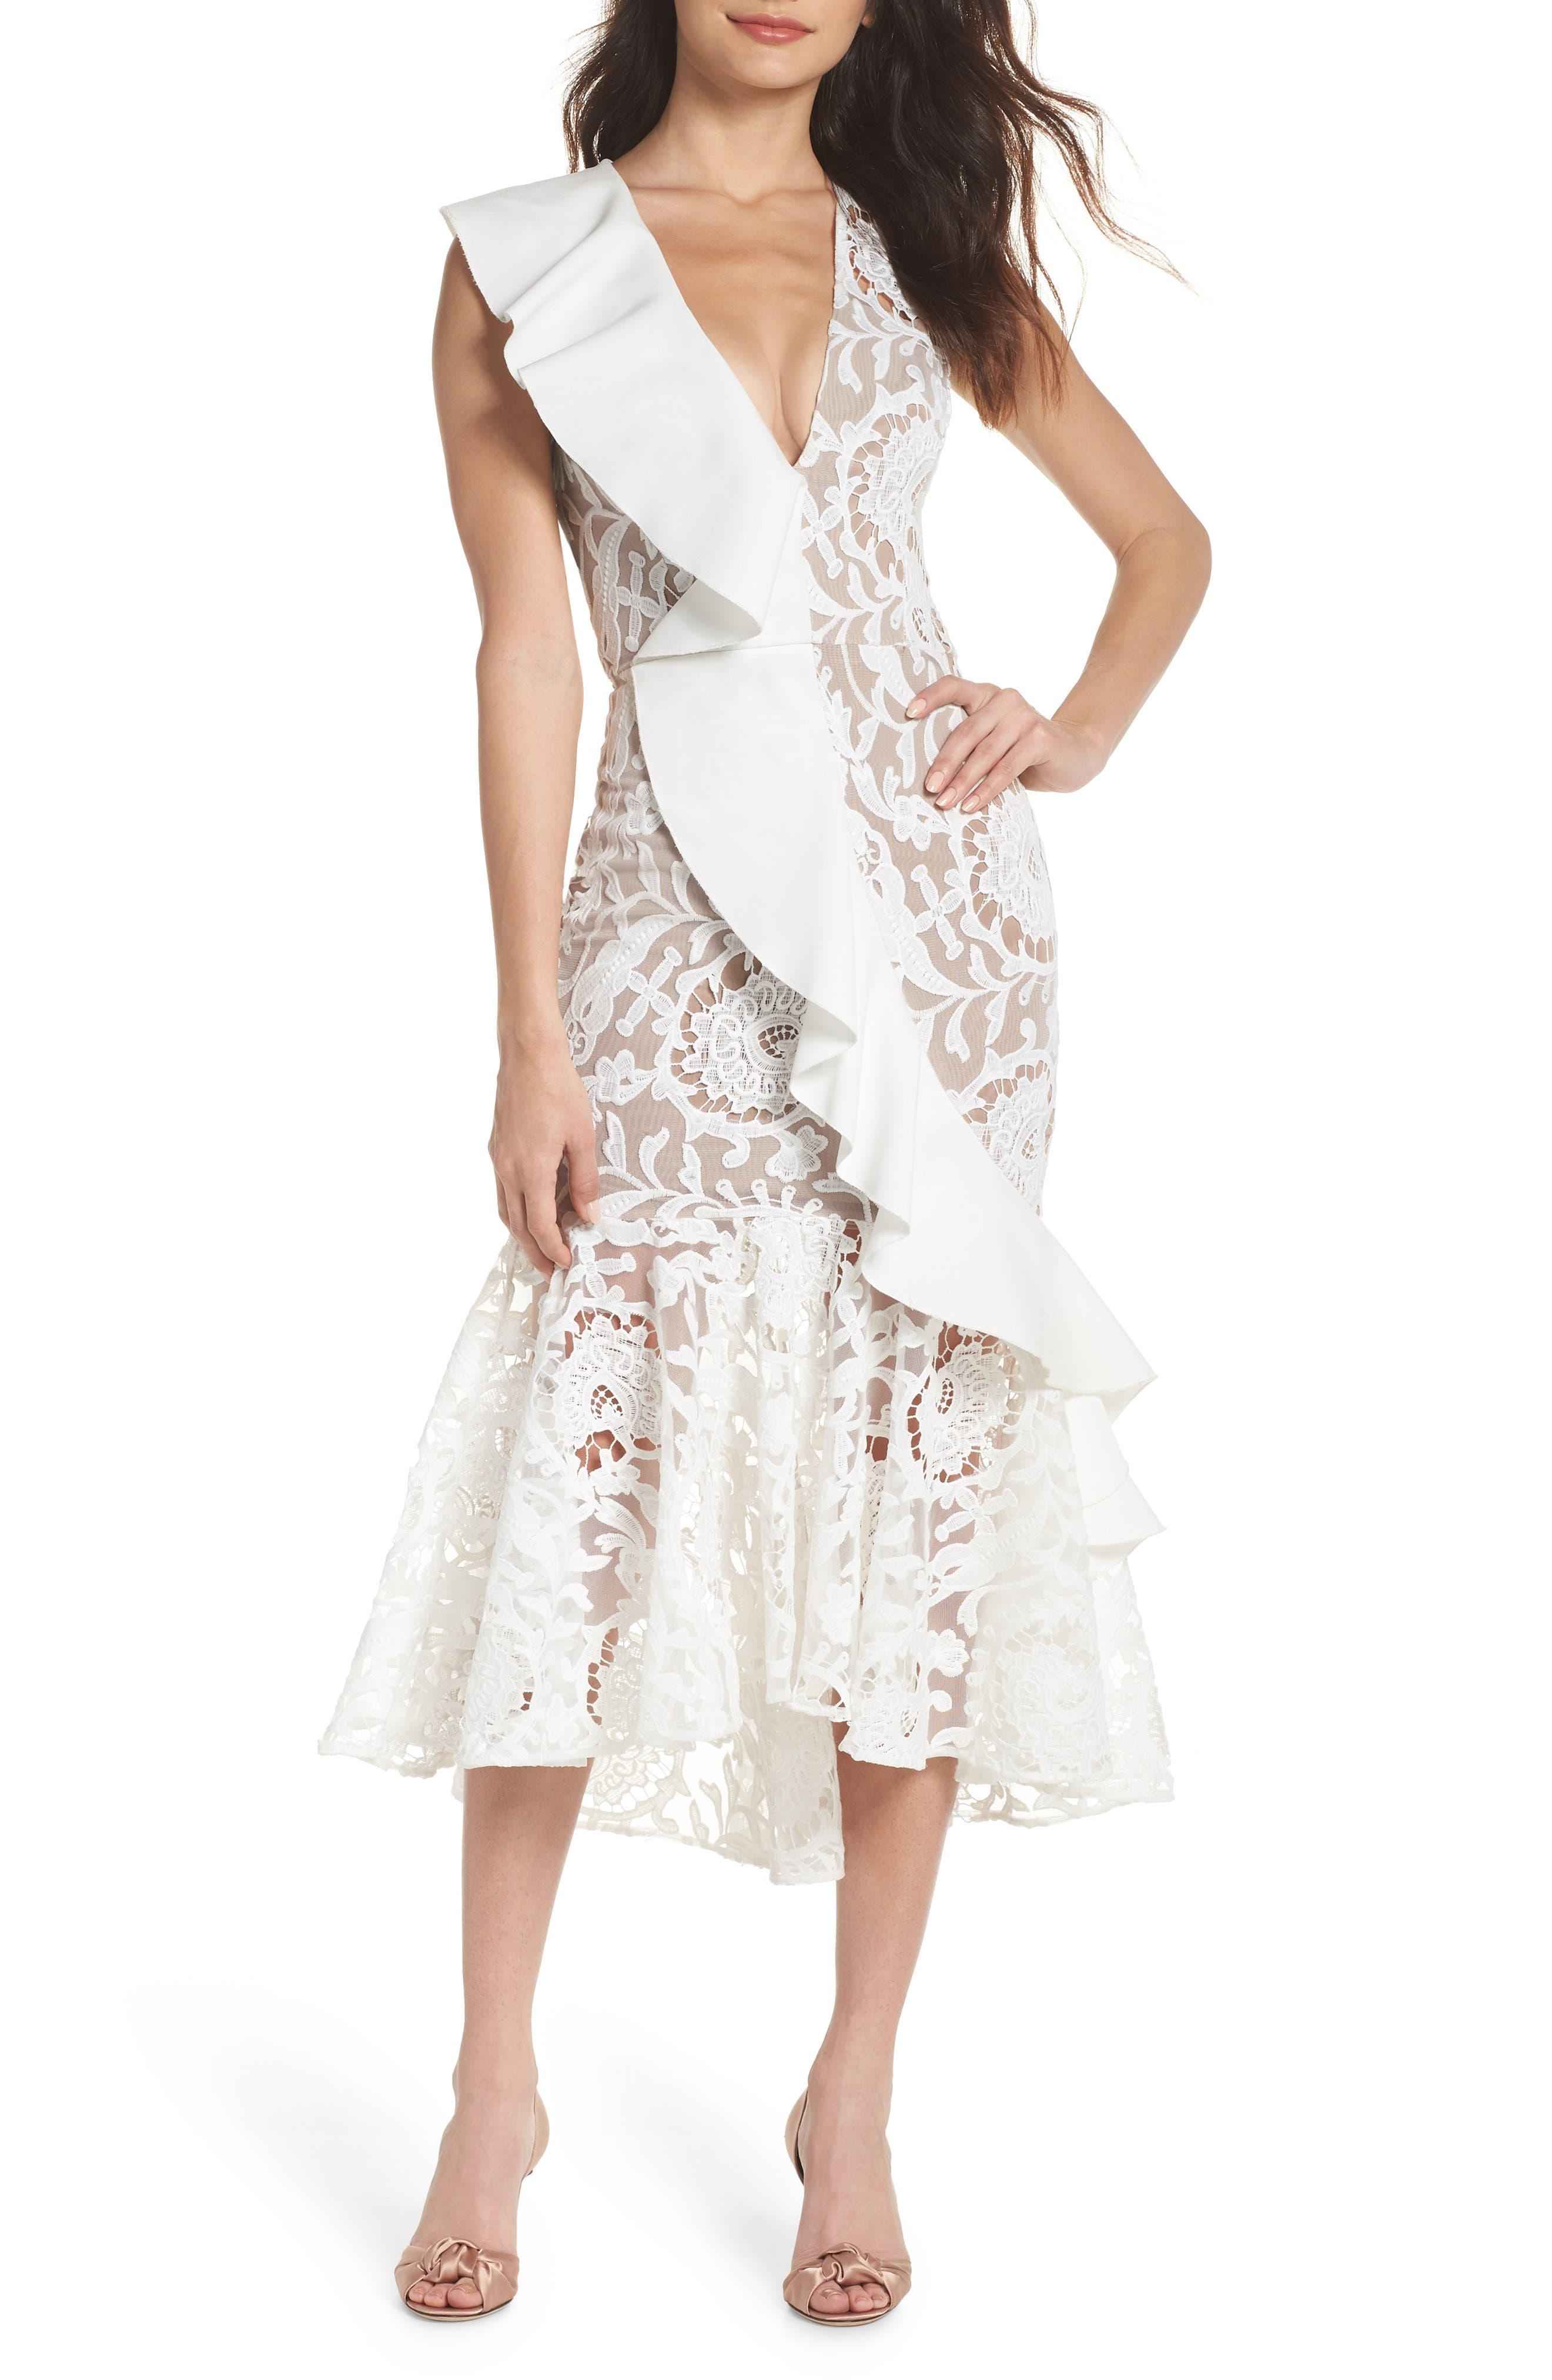 Rocha Waterfall Ruffle Lace Midi Dress,                             Main thumbnail 1, color,                             900